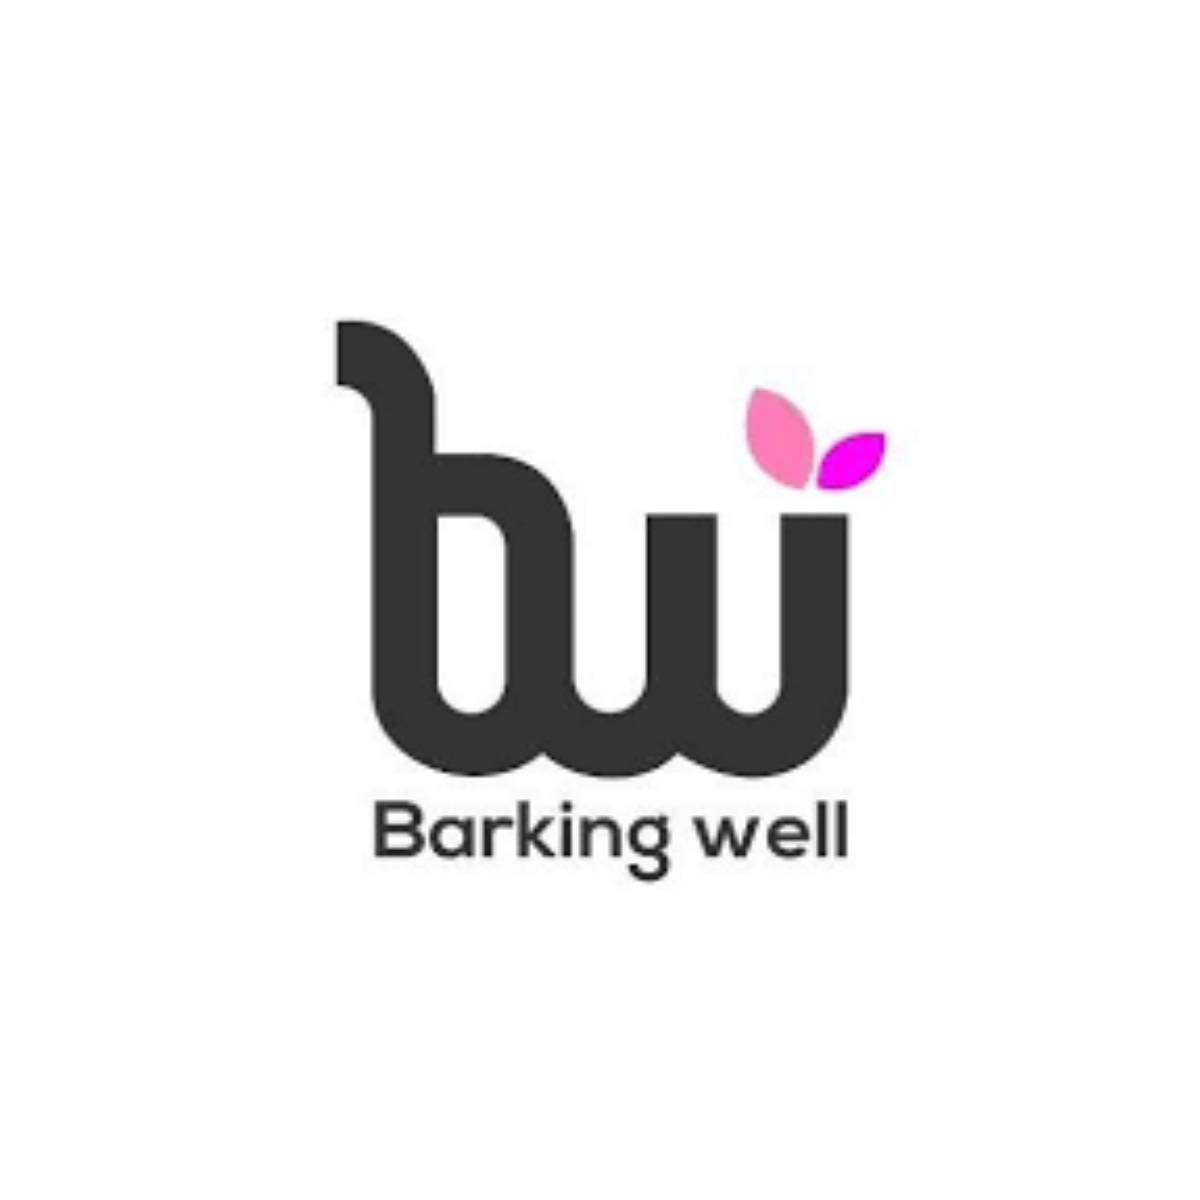 Barking Well Media: συνεργασία με την Dogs' Voice για περίθαλψη και νοσηλεία πυρόπληκτων ζώων